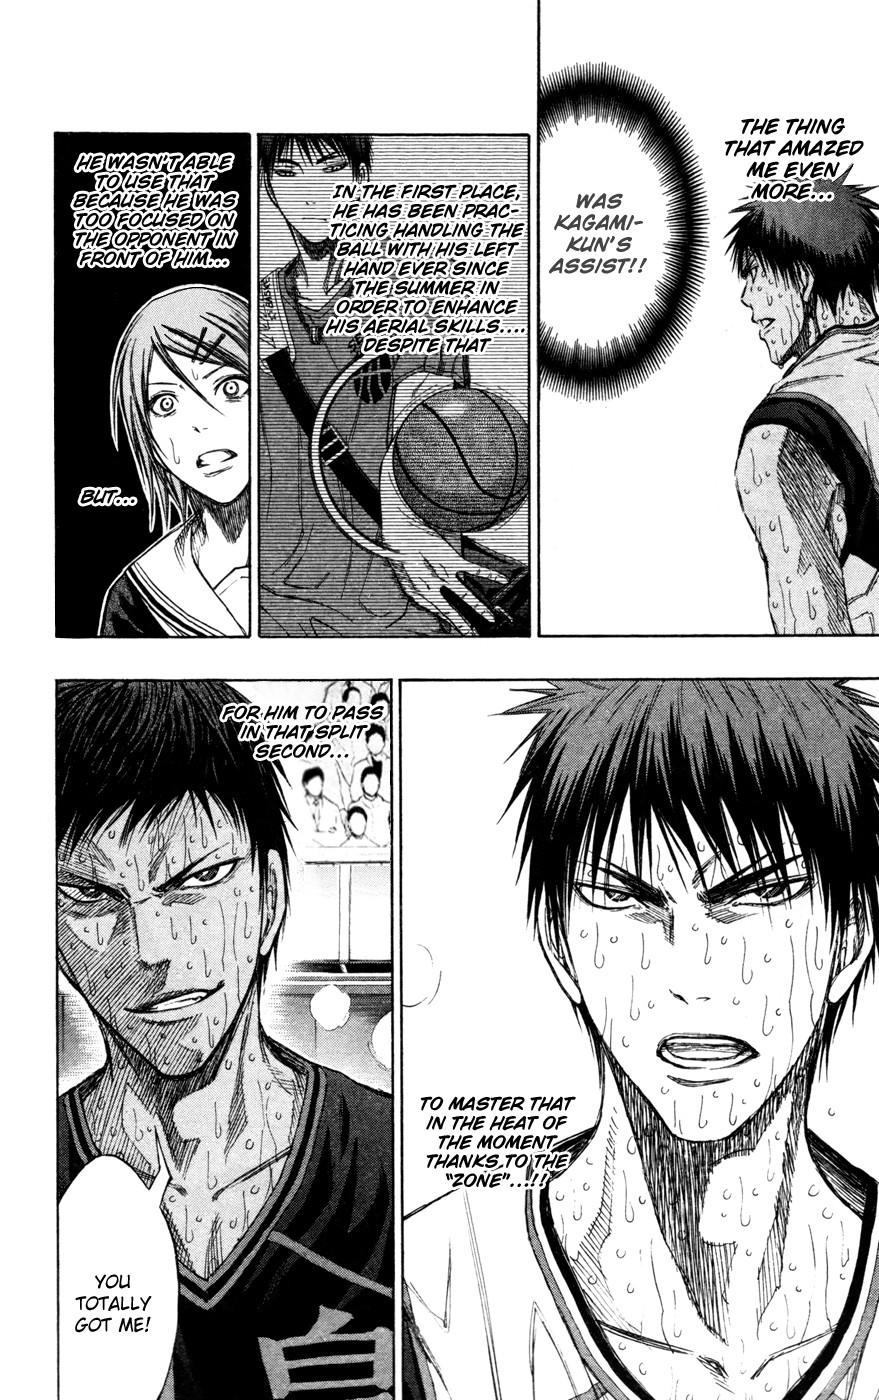 Kuroko no Basket Manga Chapter 138 - Image 06